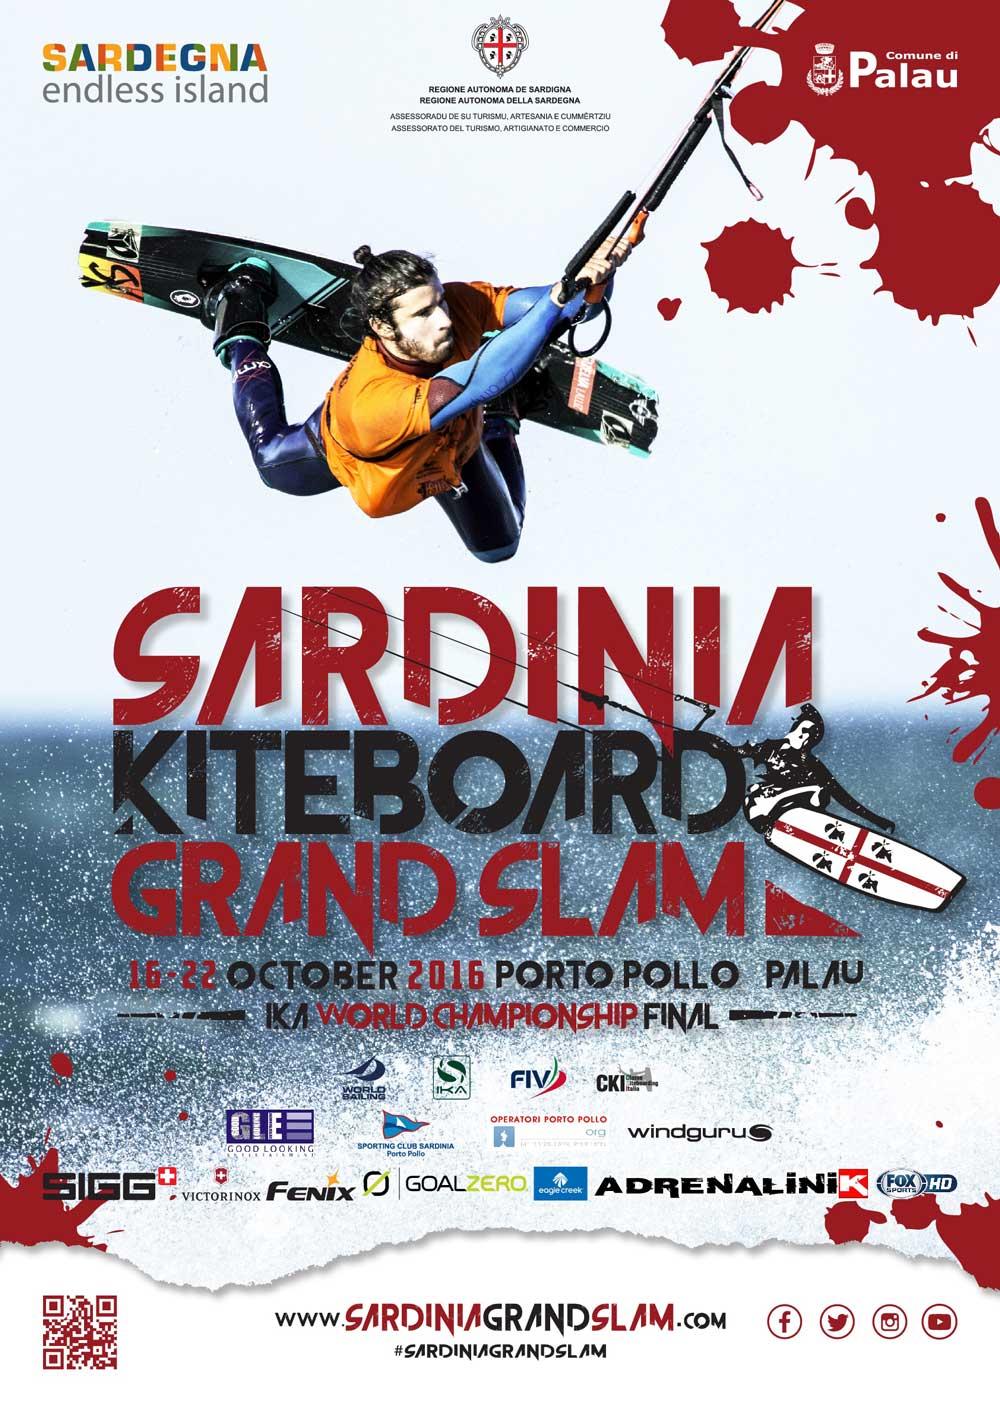 sardinia grand slam 2016